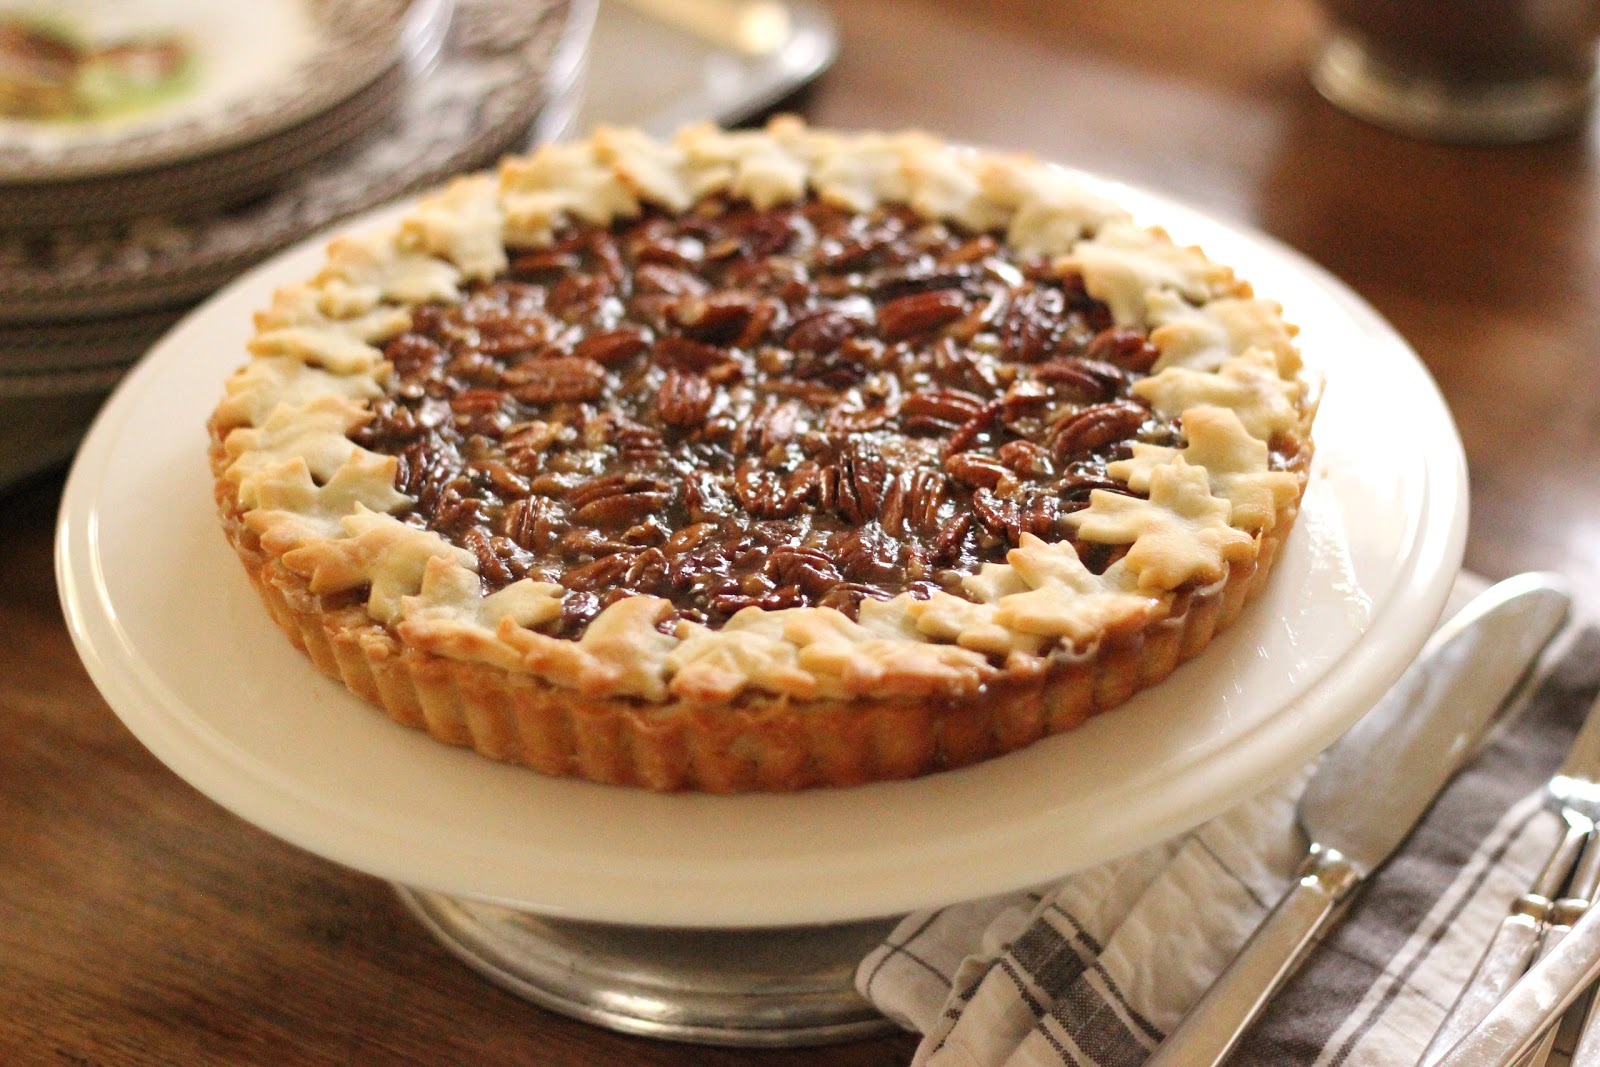 ... : Repost : Pecan Tart | A New Twist on a Classic Pecan Pie Recipe